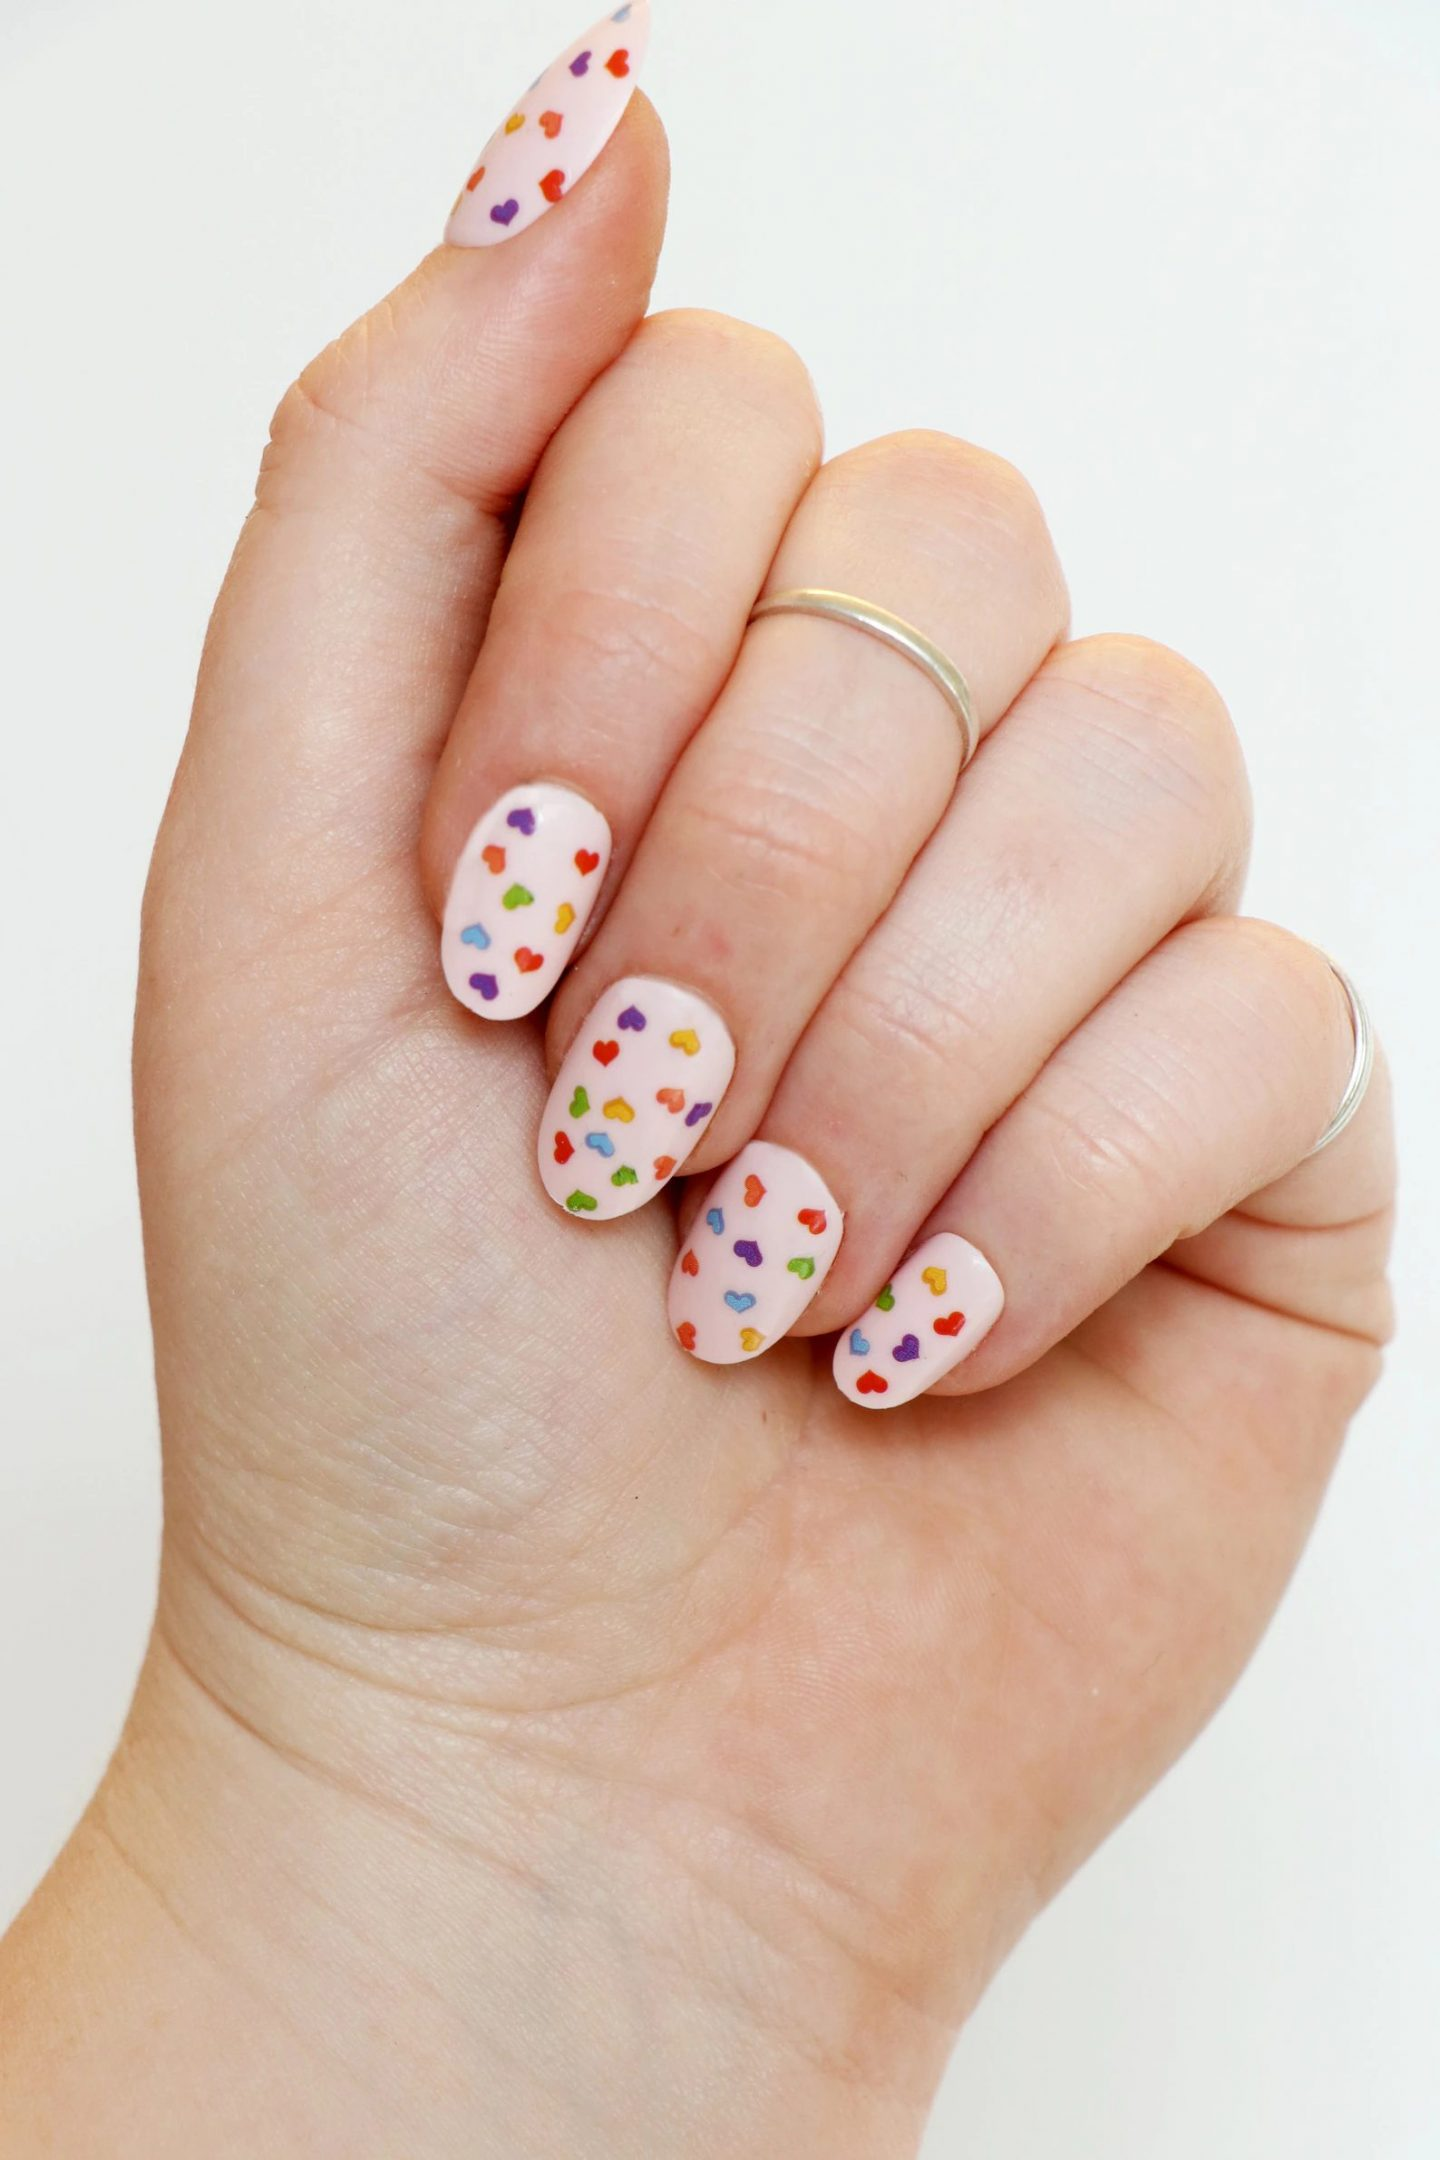 Cute short light pink nails with tiny rainbow hearts